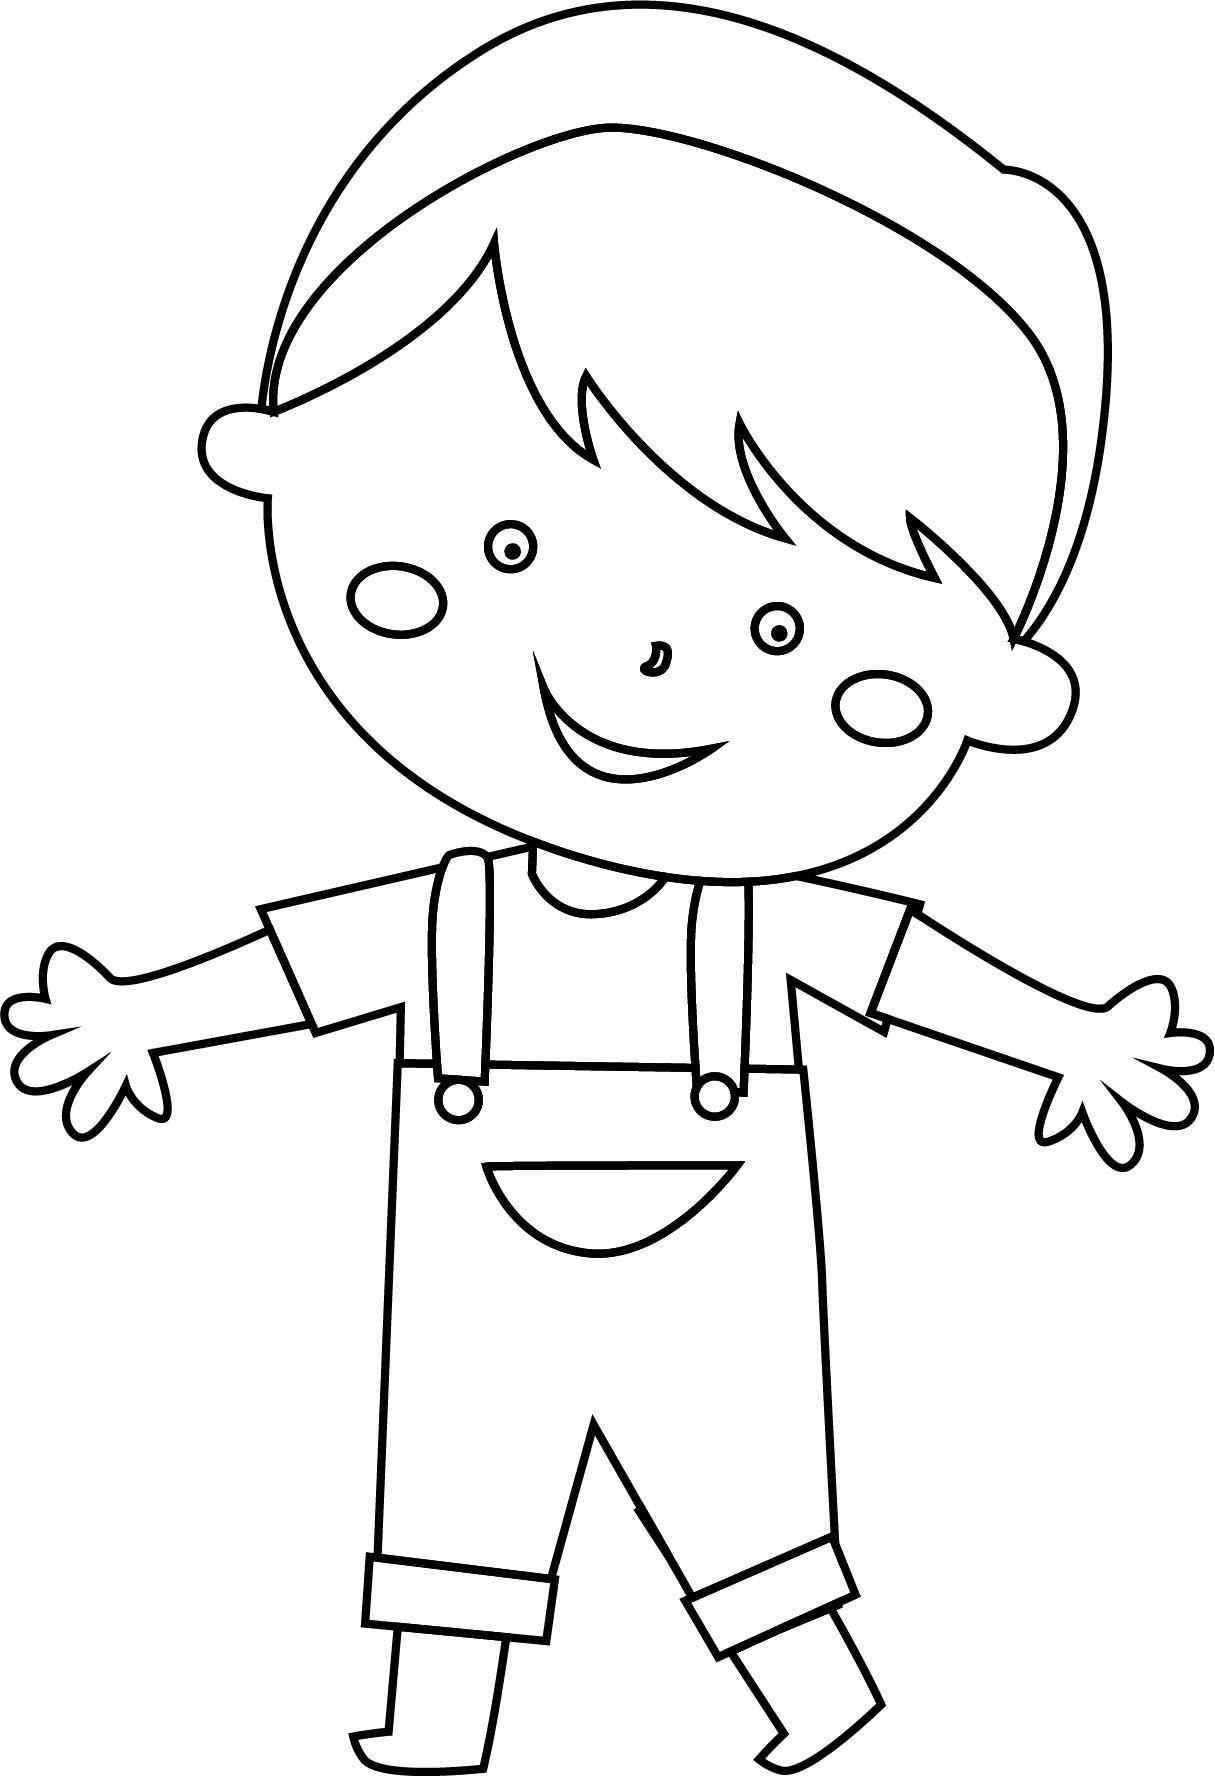 Awesome Sweet Child Boy Coloring Page Ideias Para Artesanato Artesanato Desenhos